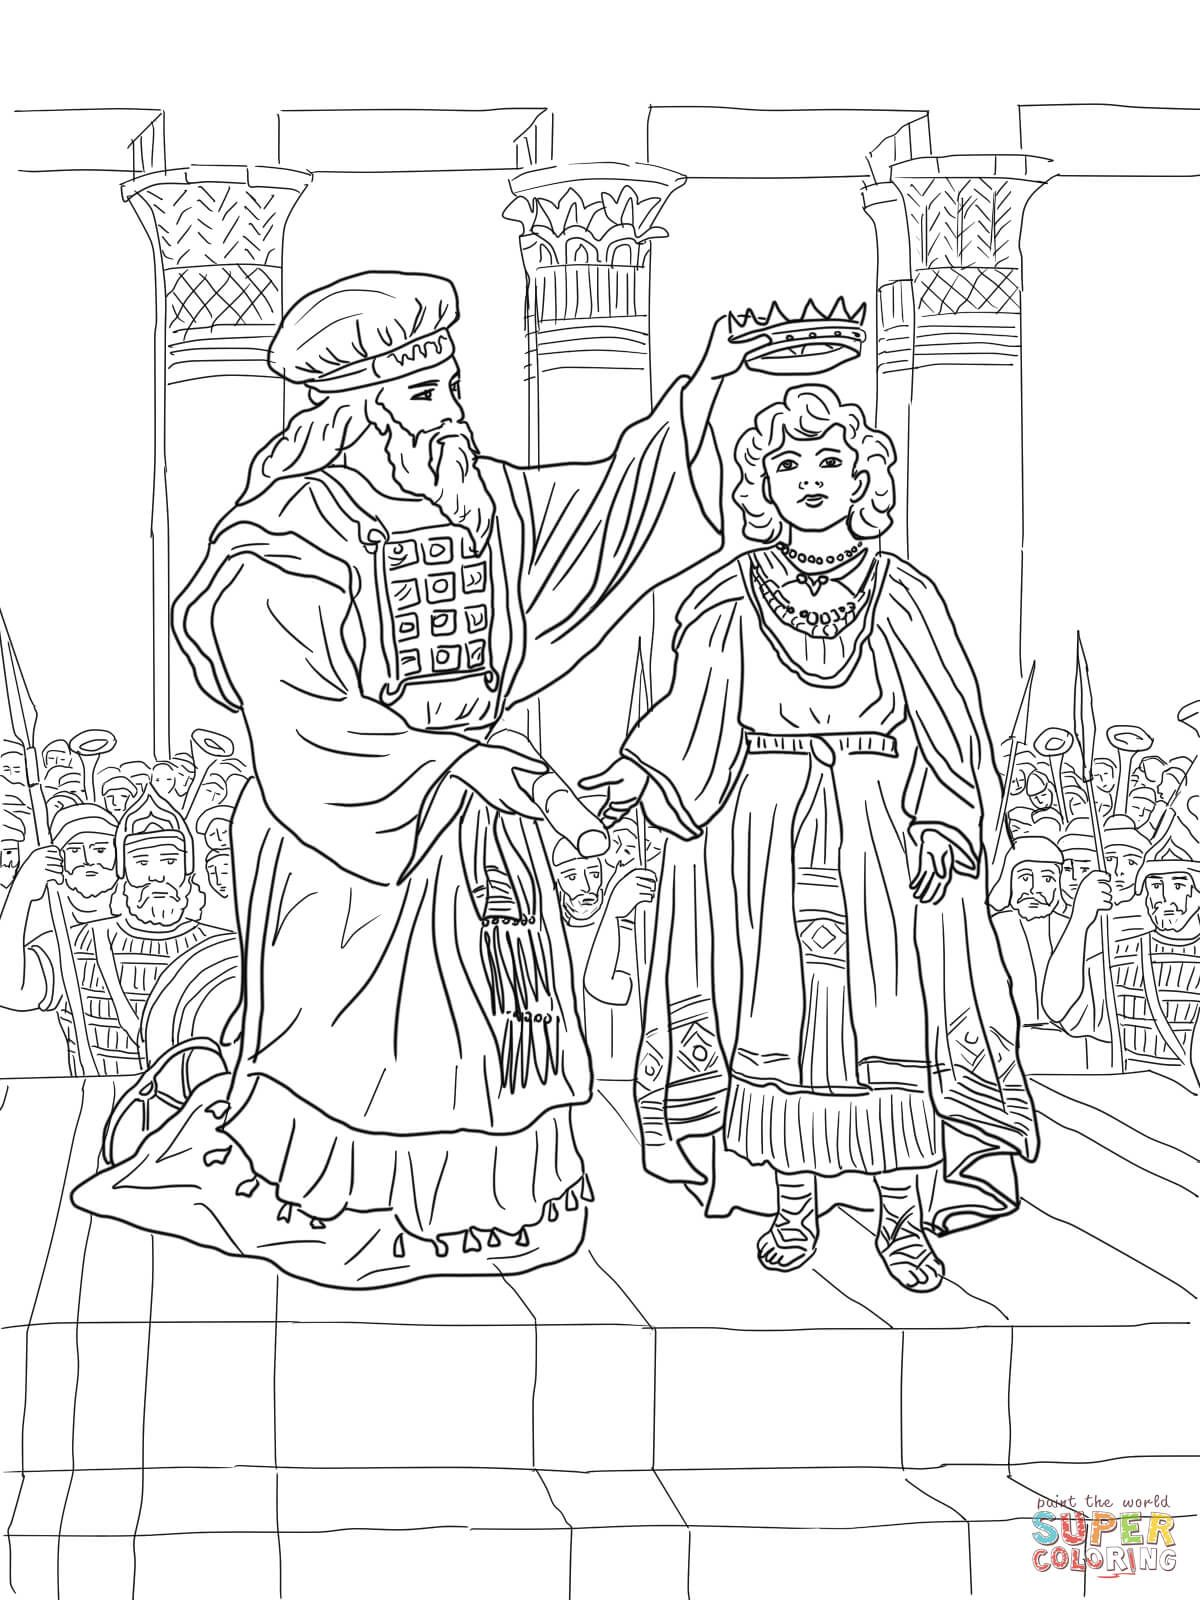 King Joash Crowned